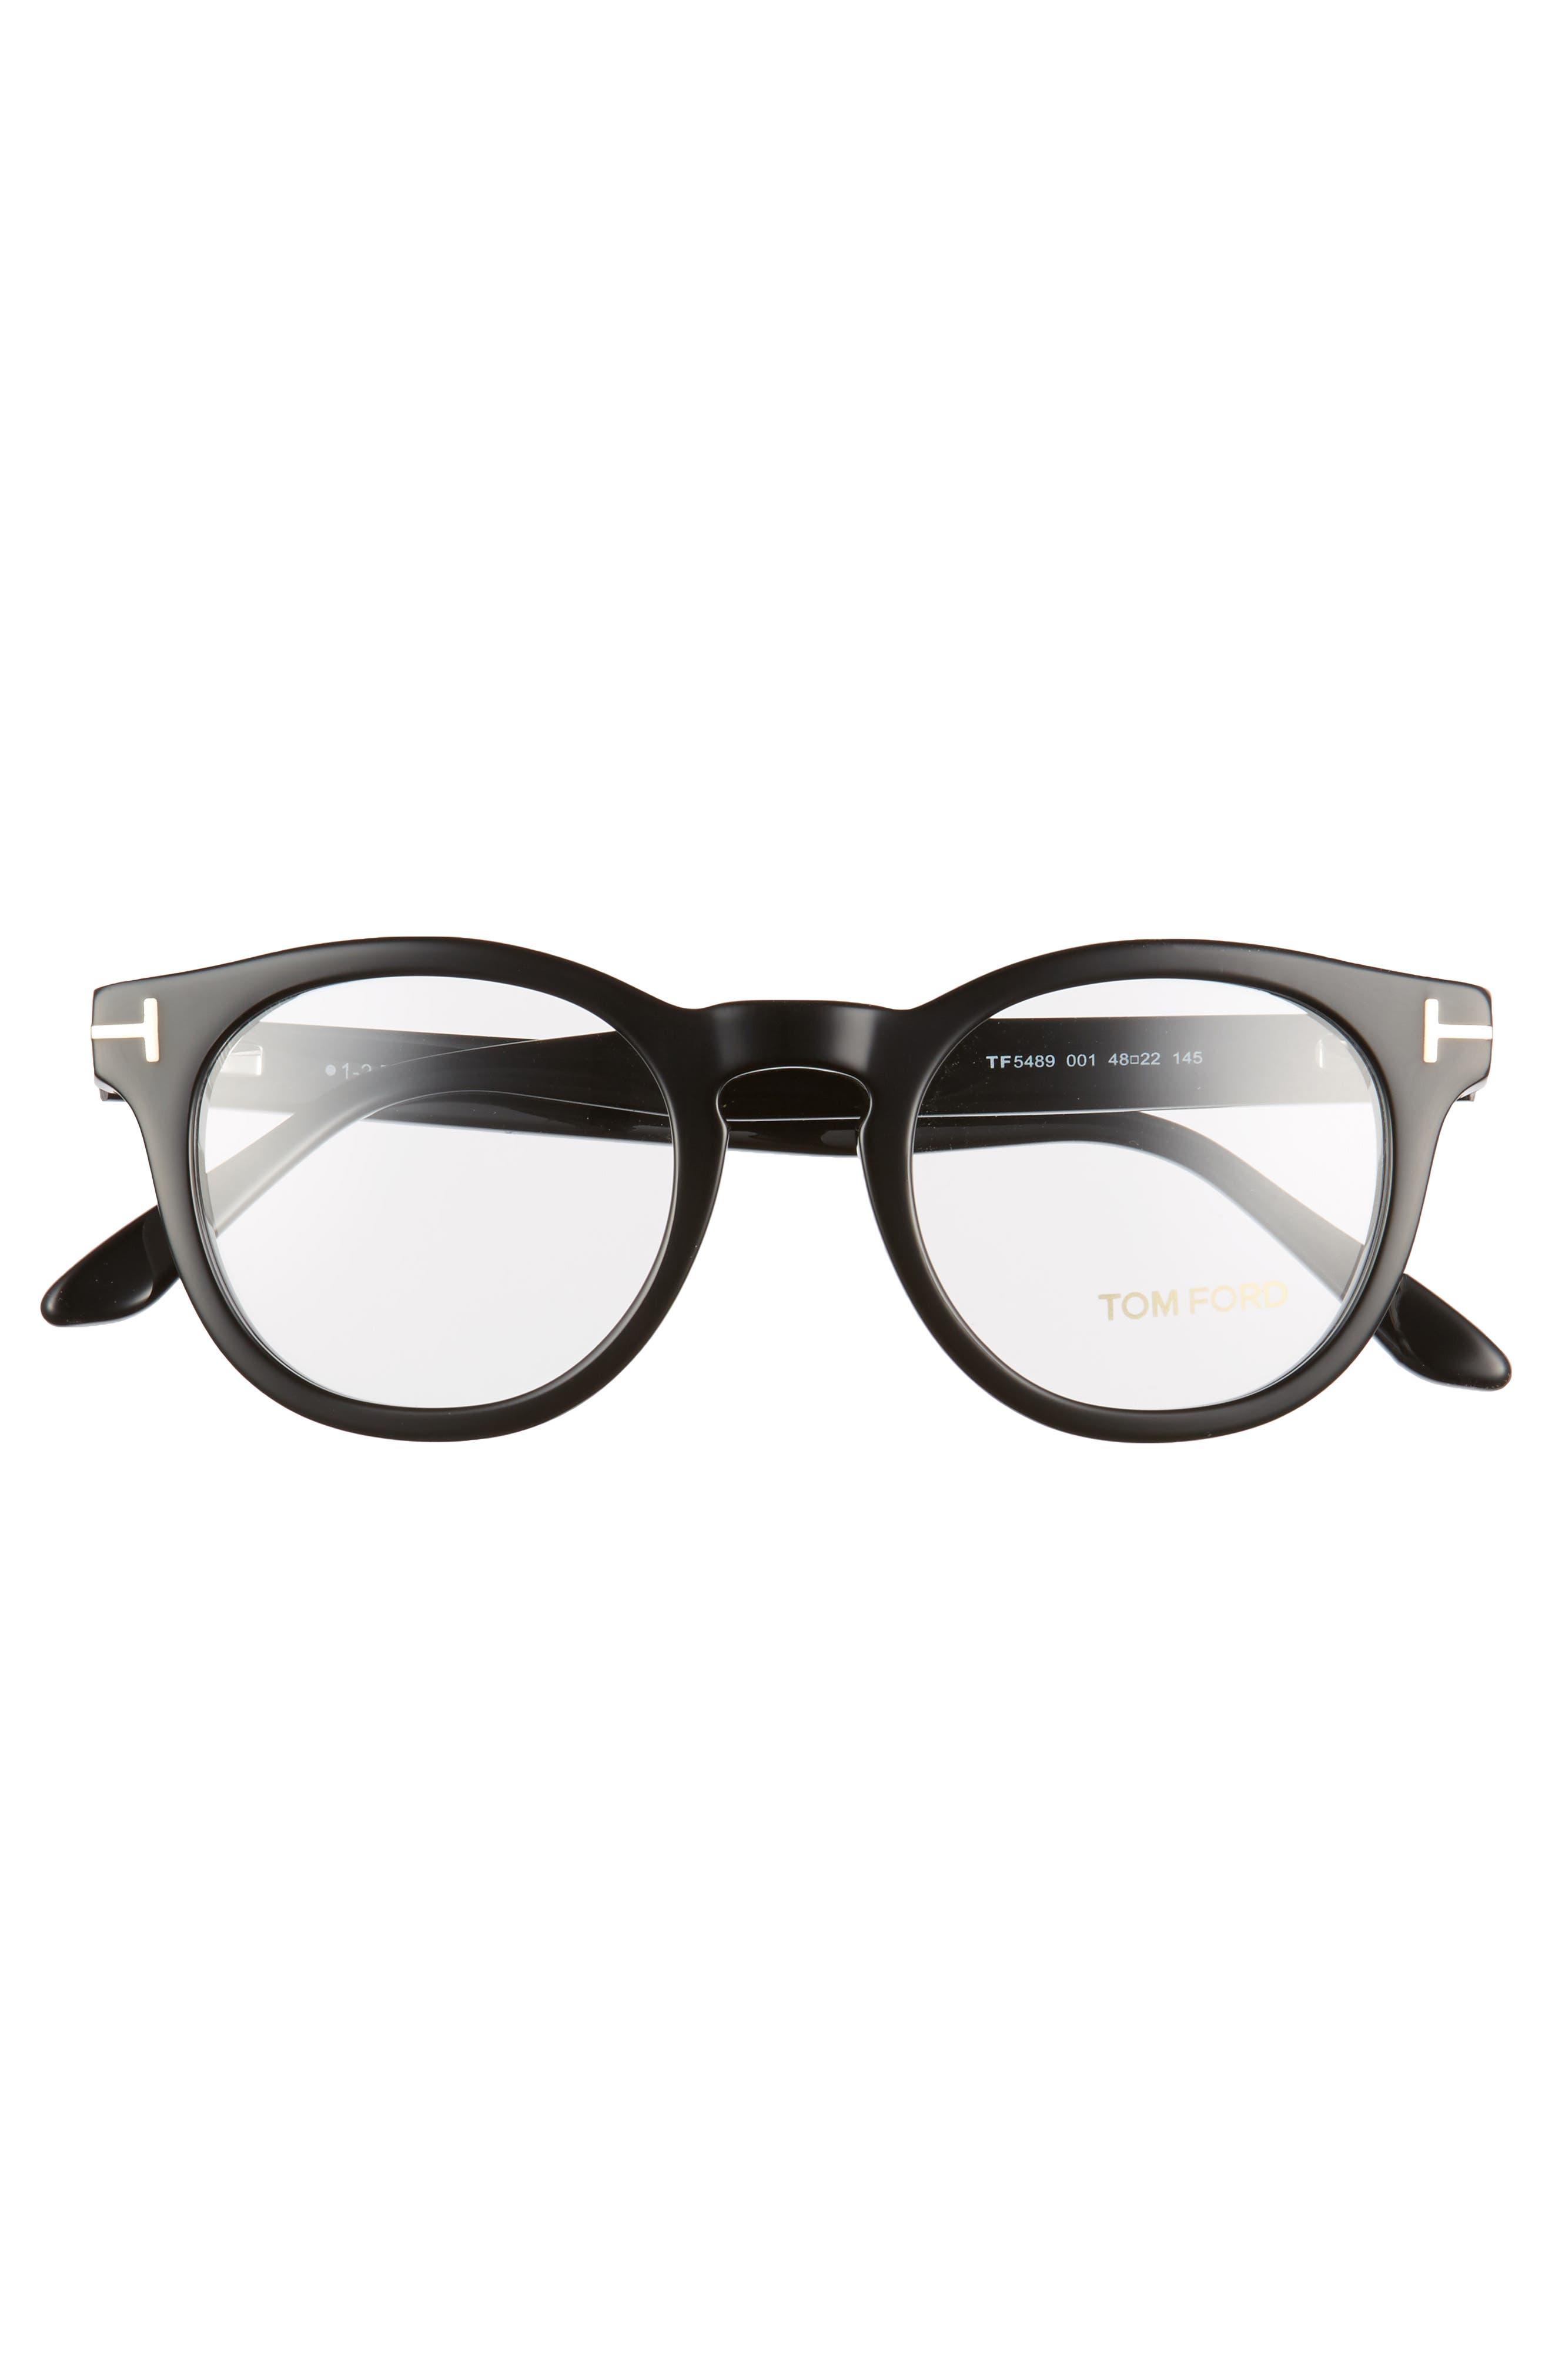 48mm Round Optical Glasses,                             Alternate thumbnail 3, color,                             001